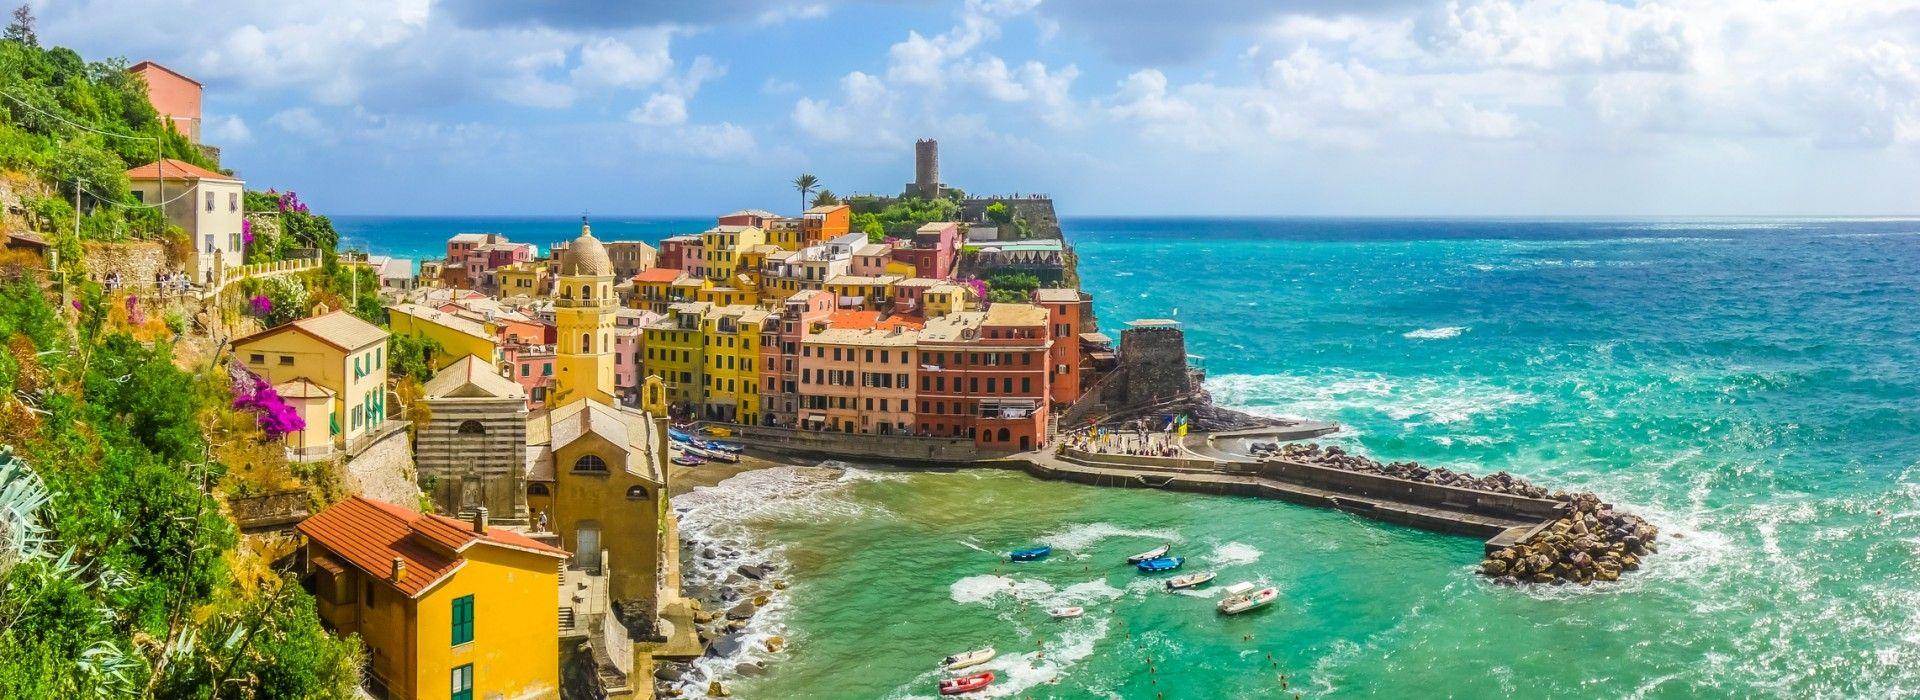 Adventure and sport activities Tours in Puglia